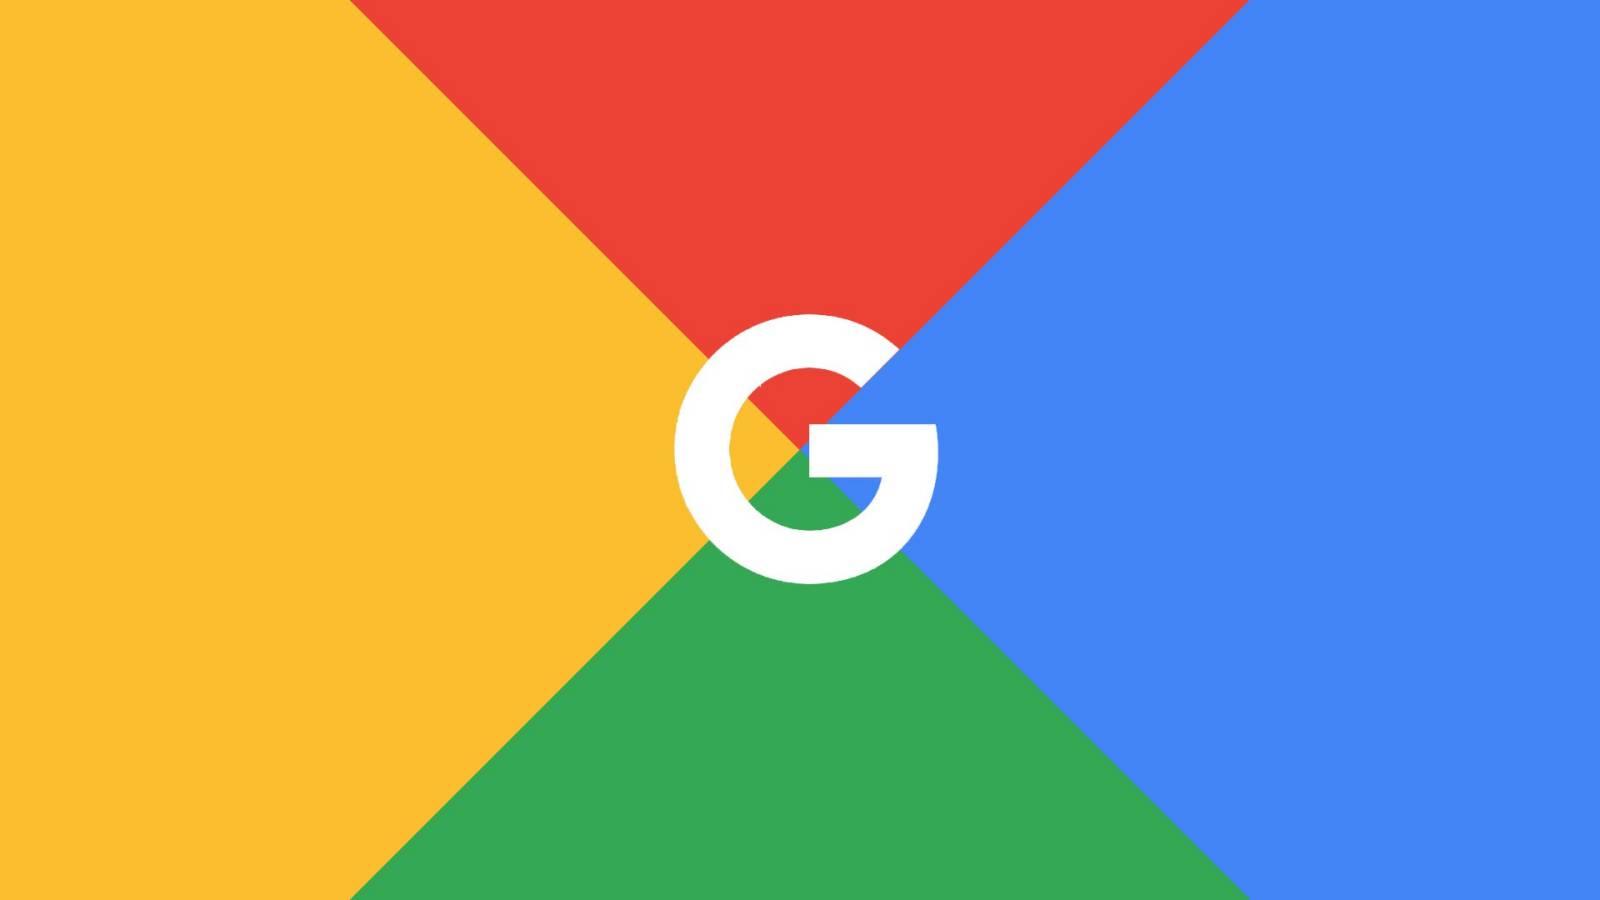 Google pixel 4 3a